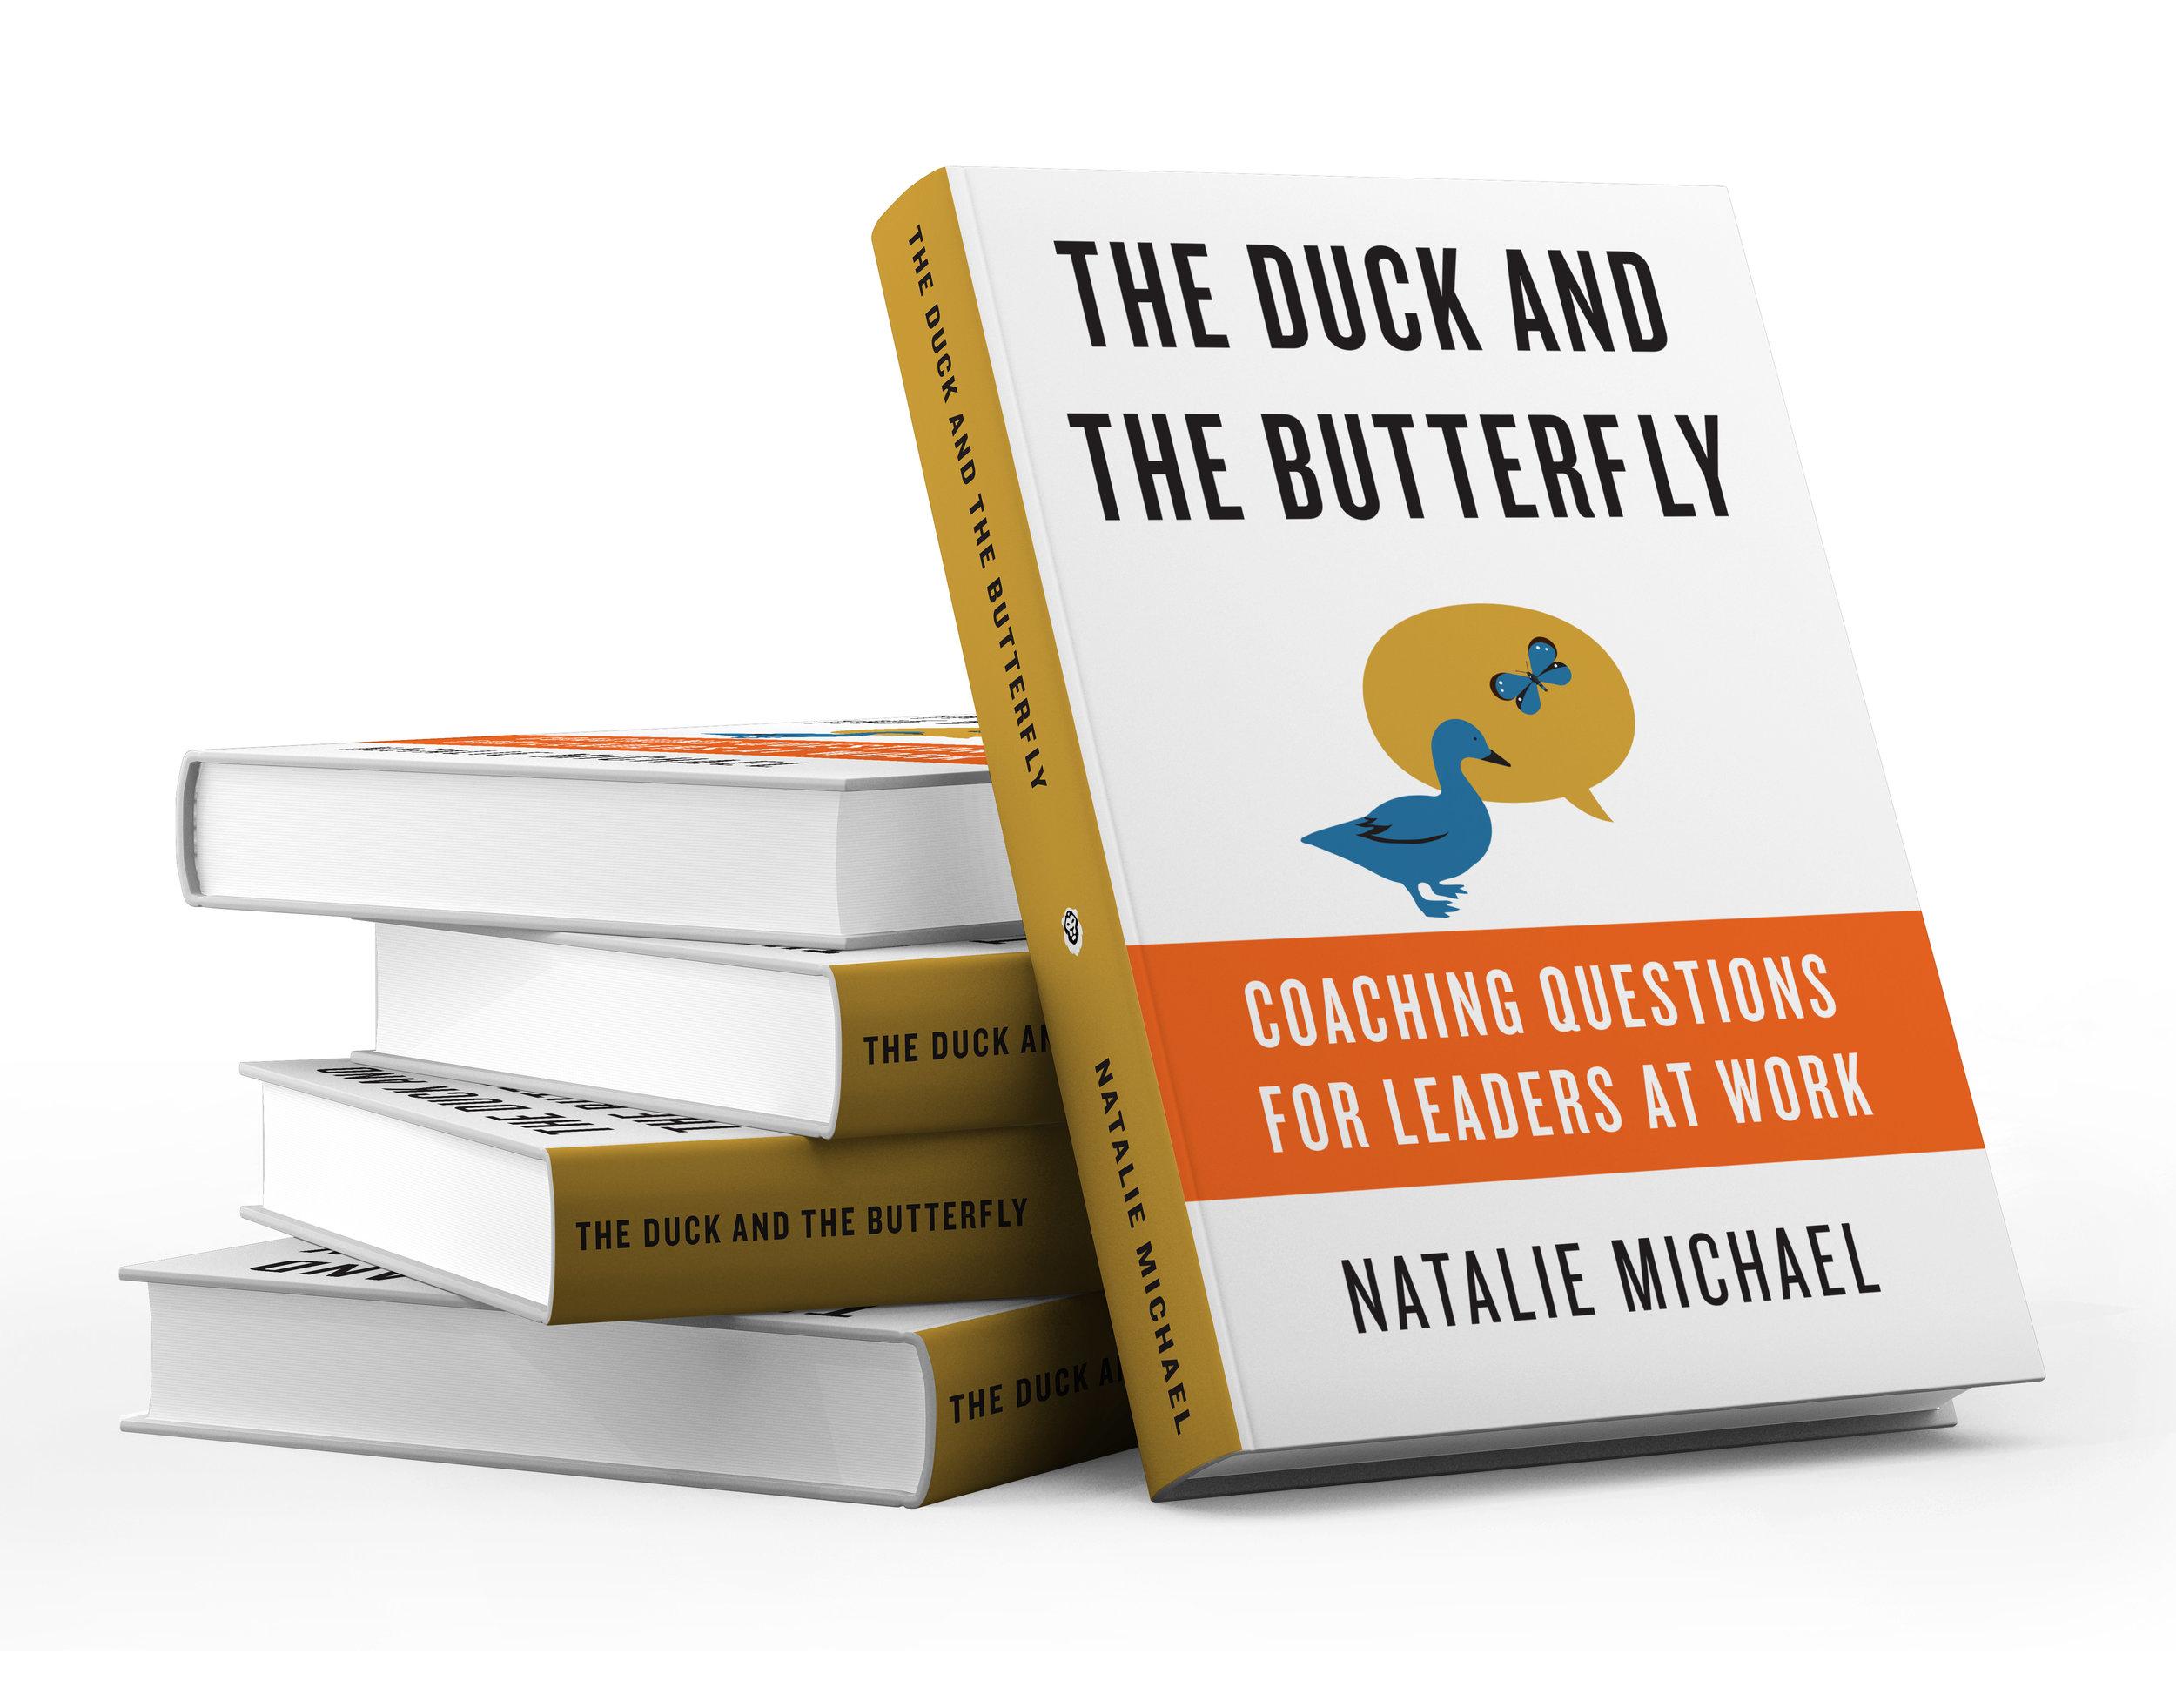 DuckbookStack.jpg